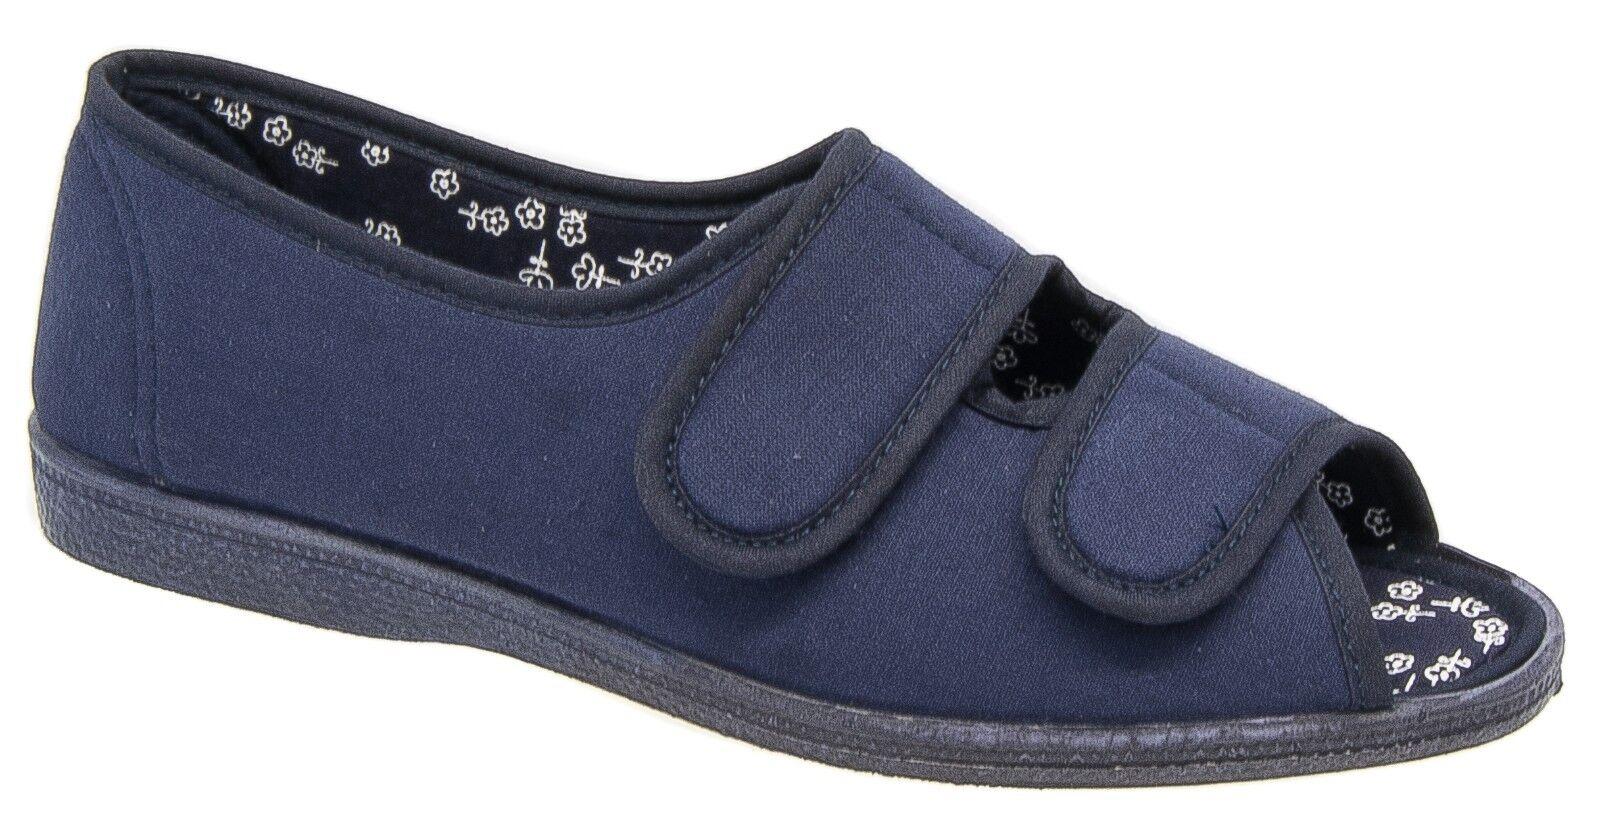 Womens Ladies Wide EE Slippers / Navy Blue Washable Sleepers 3 4 5 6 7 8 9